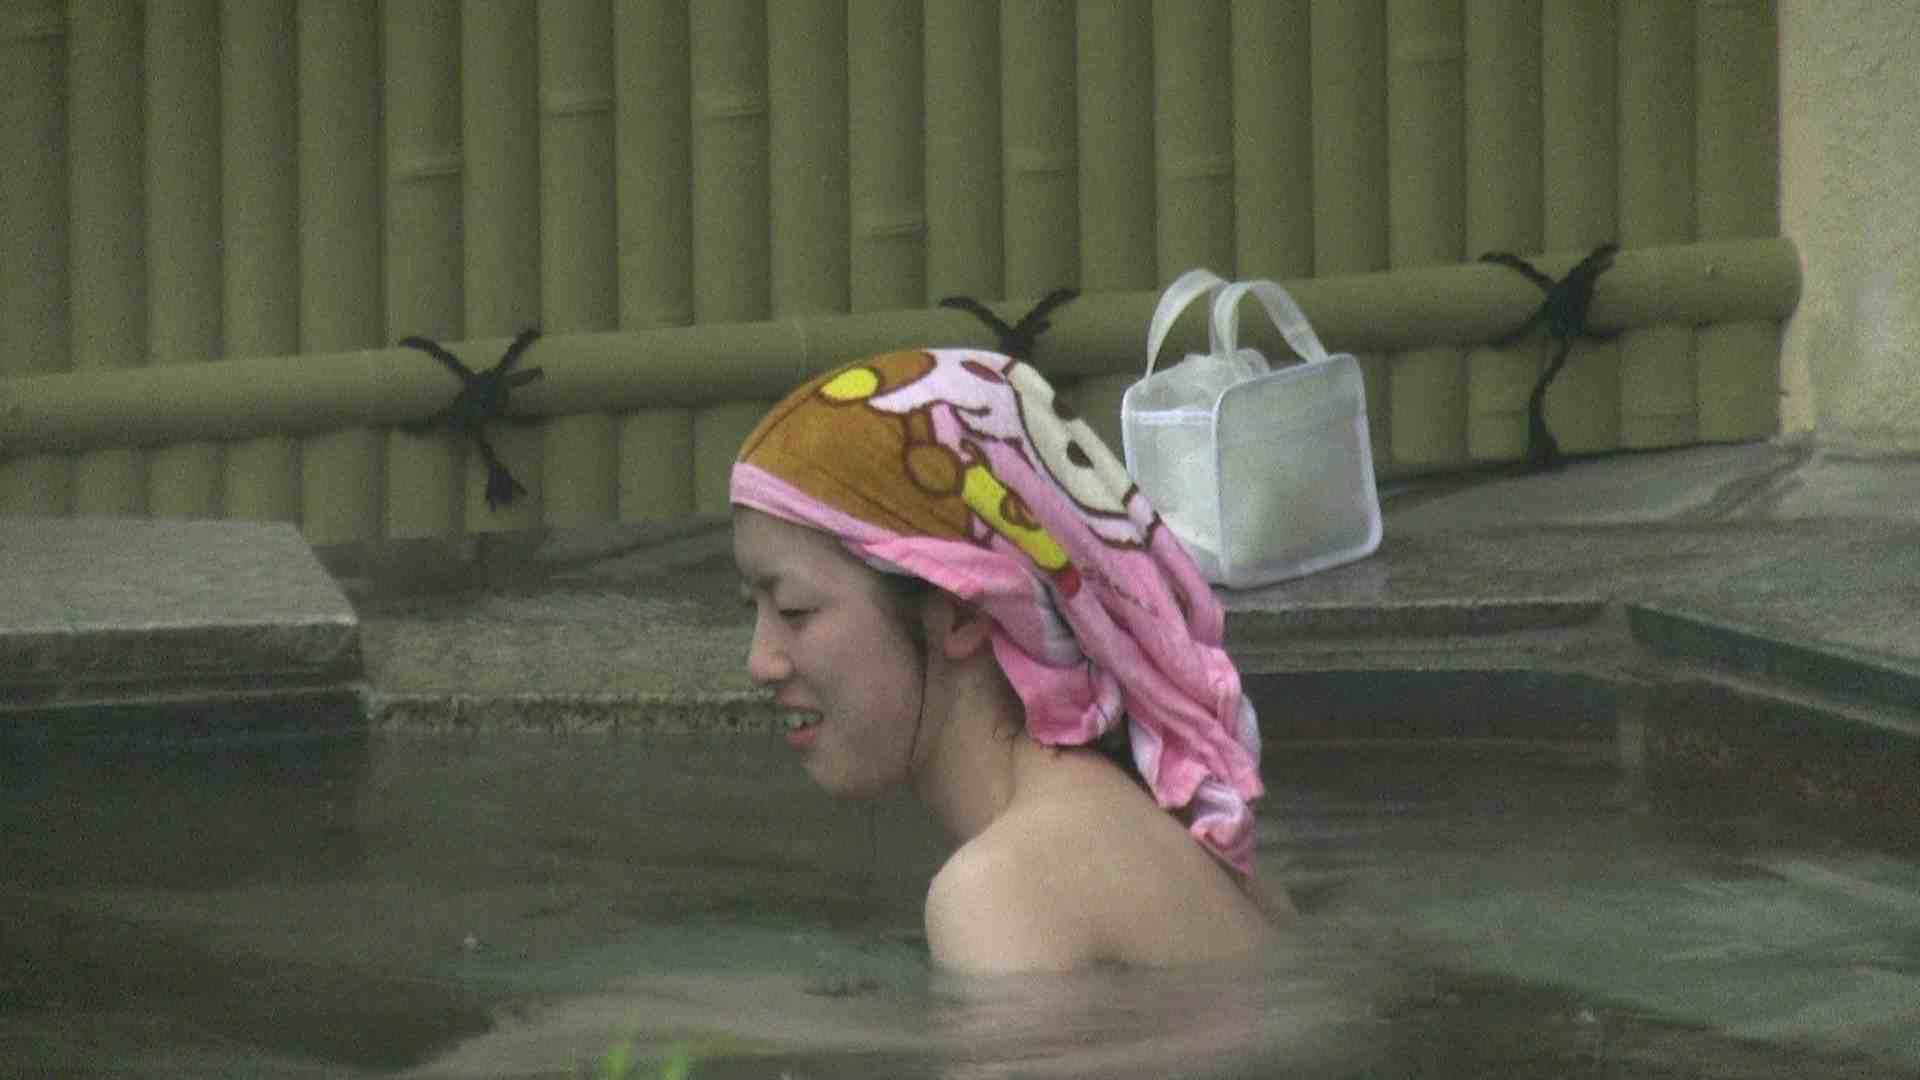 Aquaな露天風呂Vol.171 OLエロ画像 盗撮戯れ無修正画像 108PICs 95